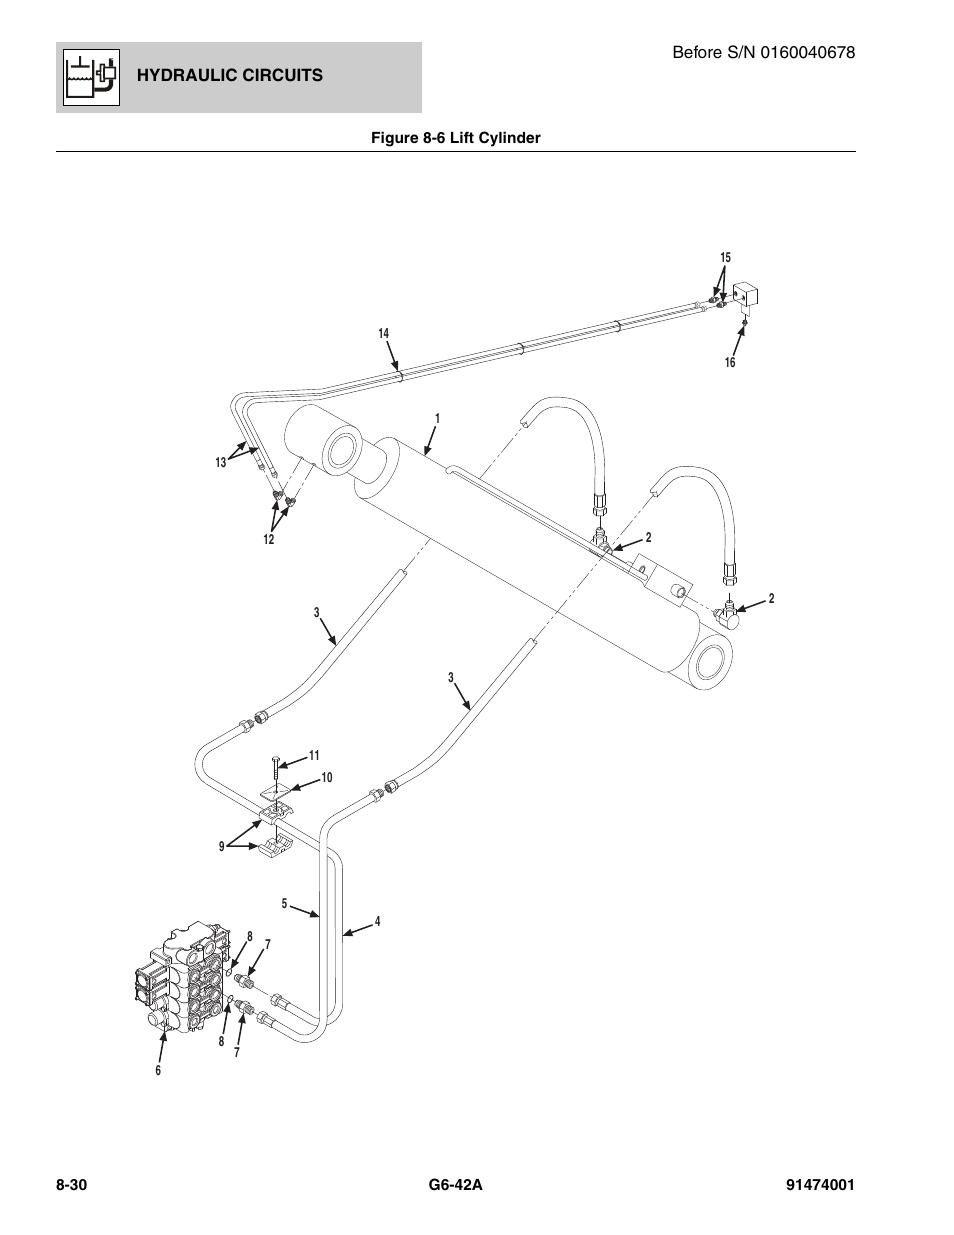 Figure 8-6 Lift Cylinder  Lift Cylinder